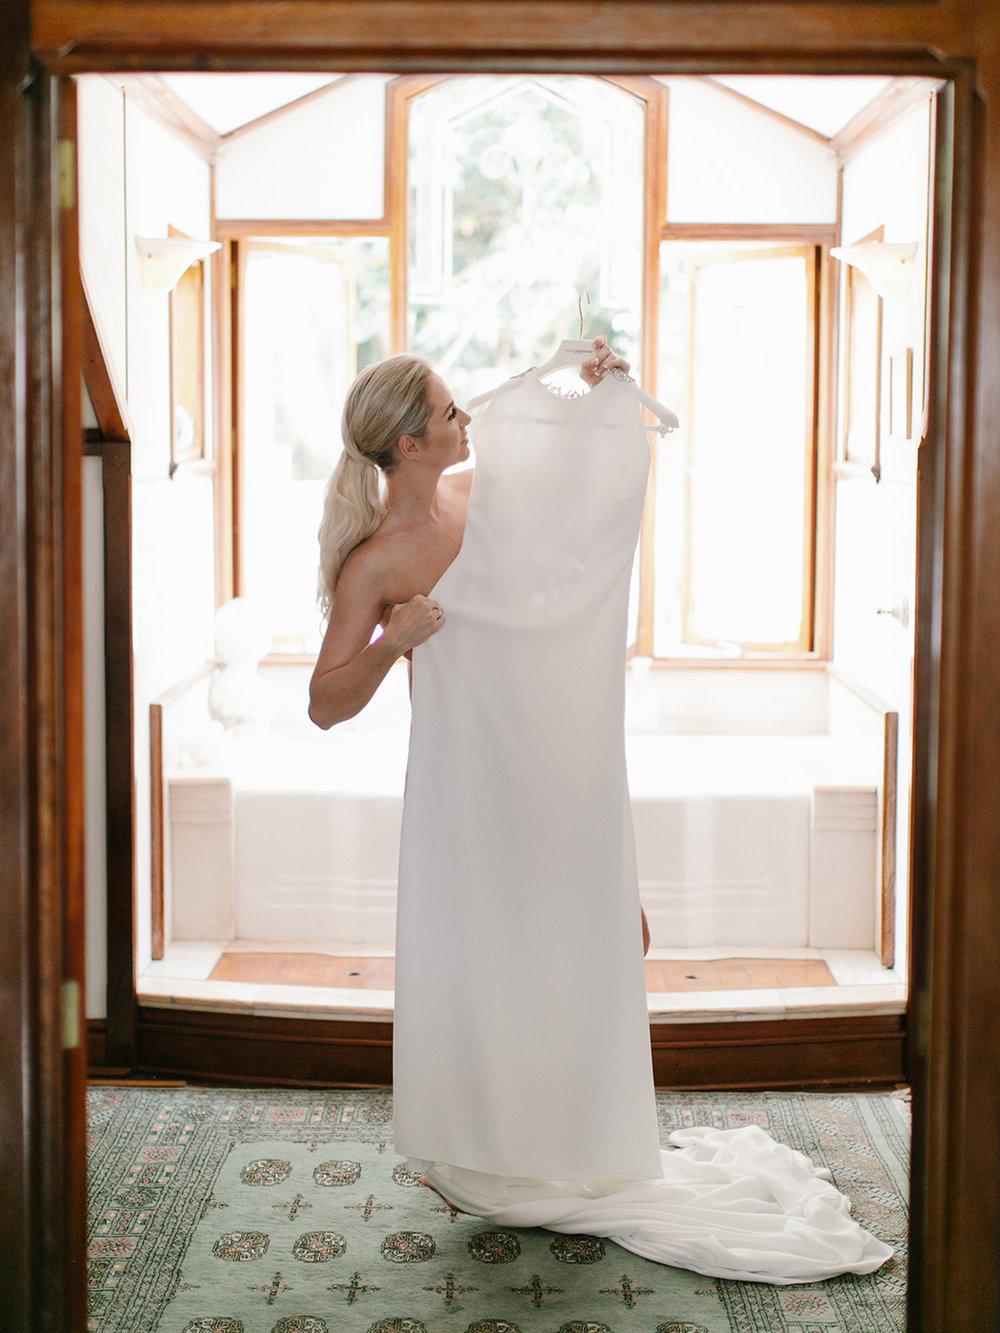 Bride Getting Ready | Rensche Mari Photography